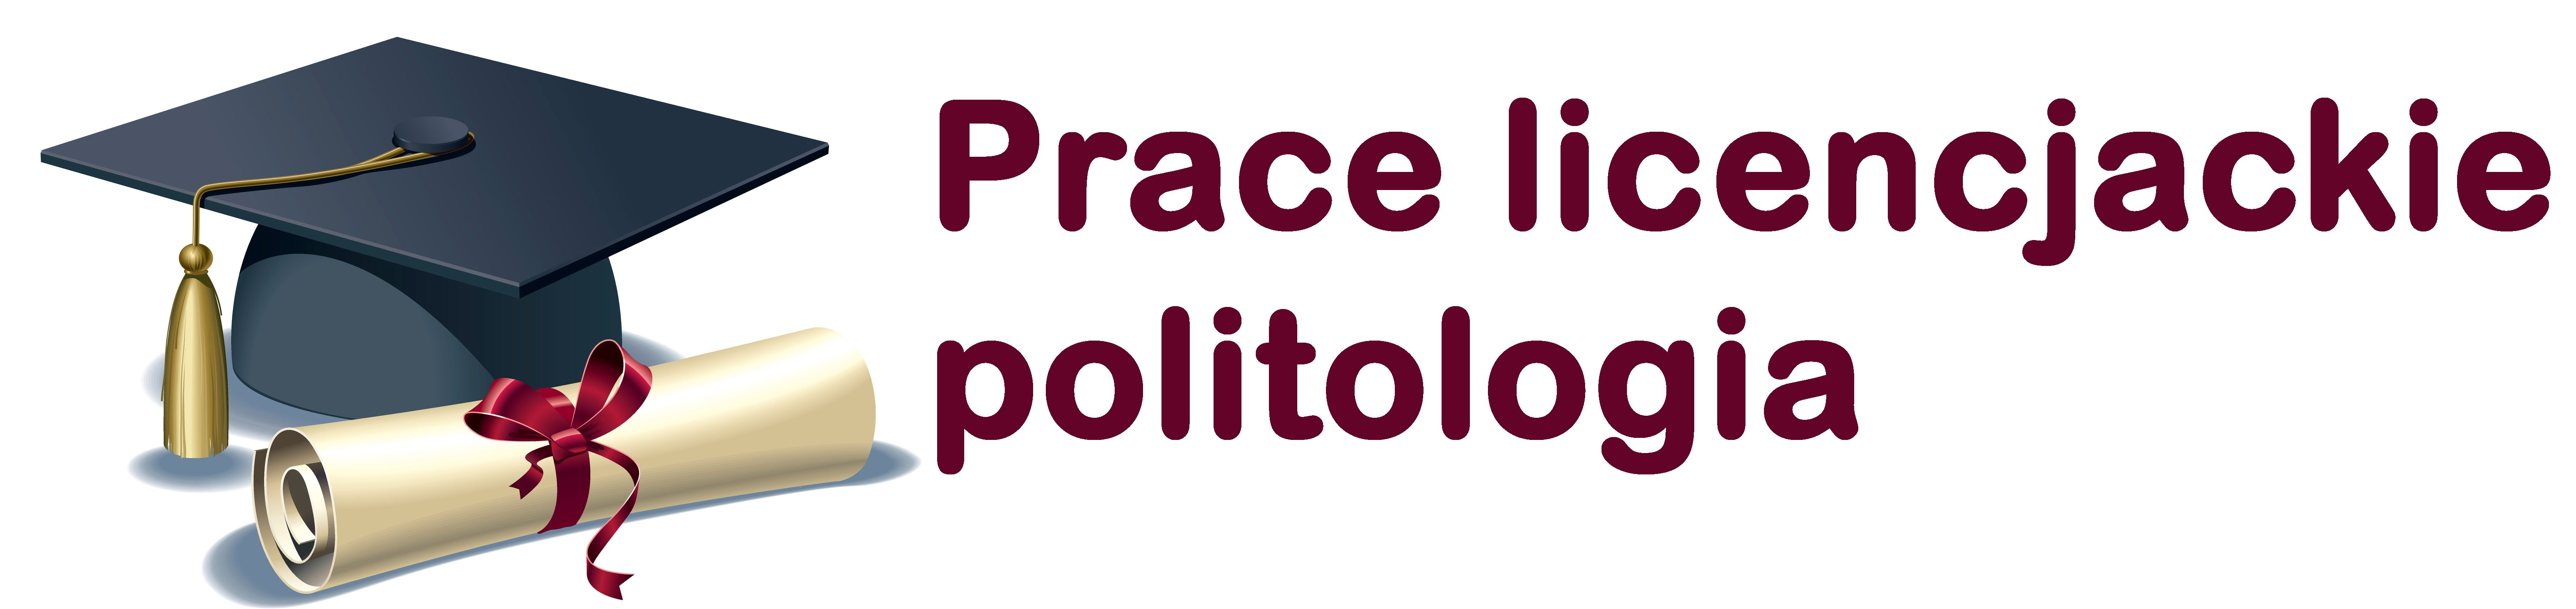 Prace licencjackie – politologia